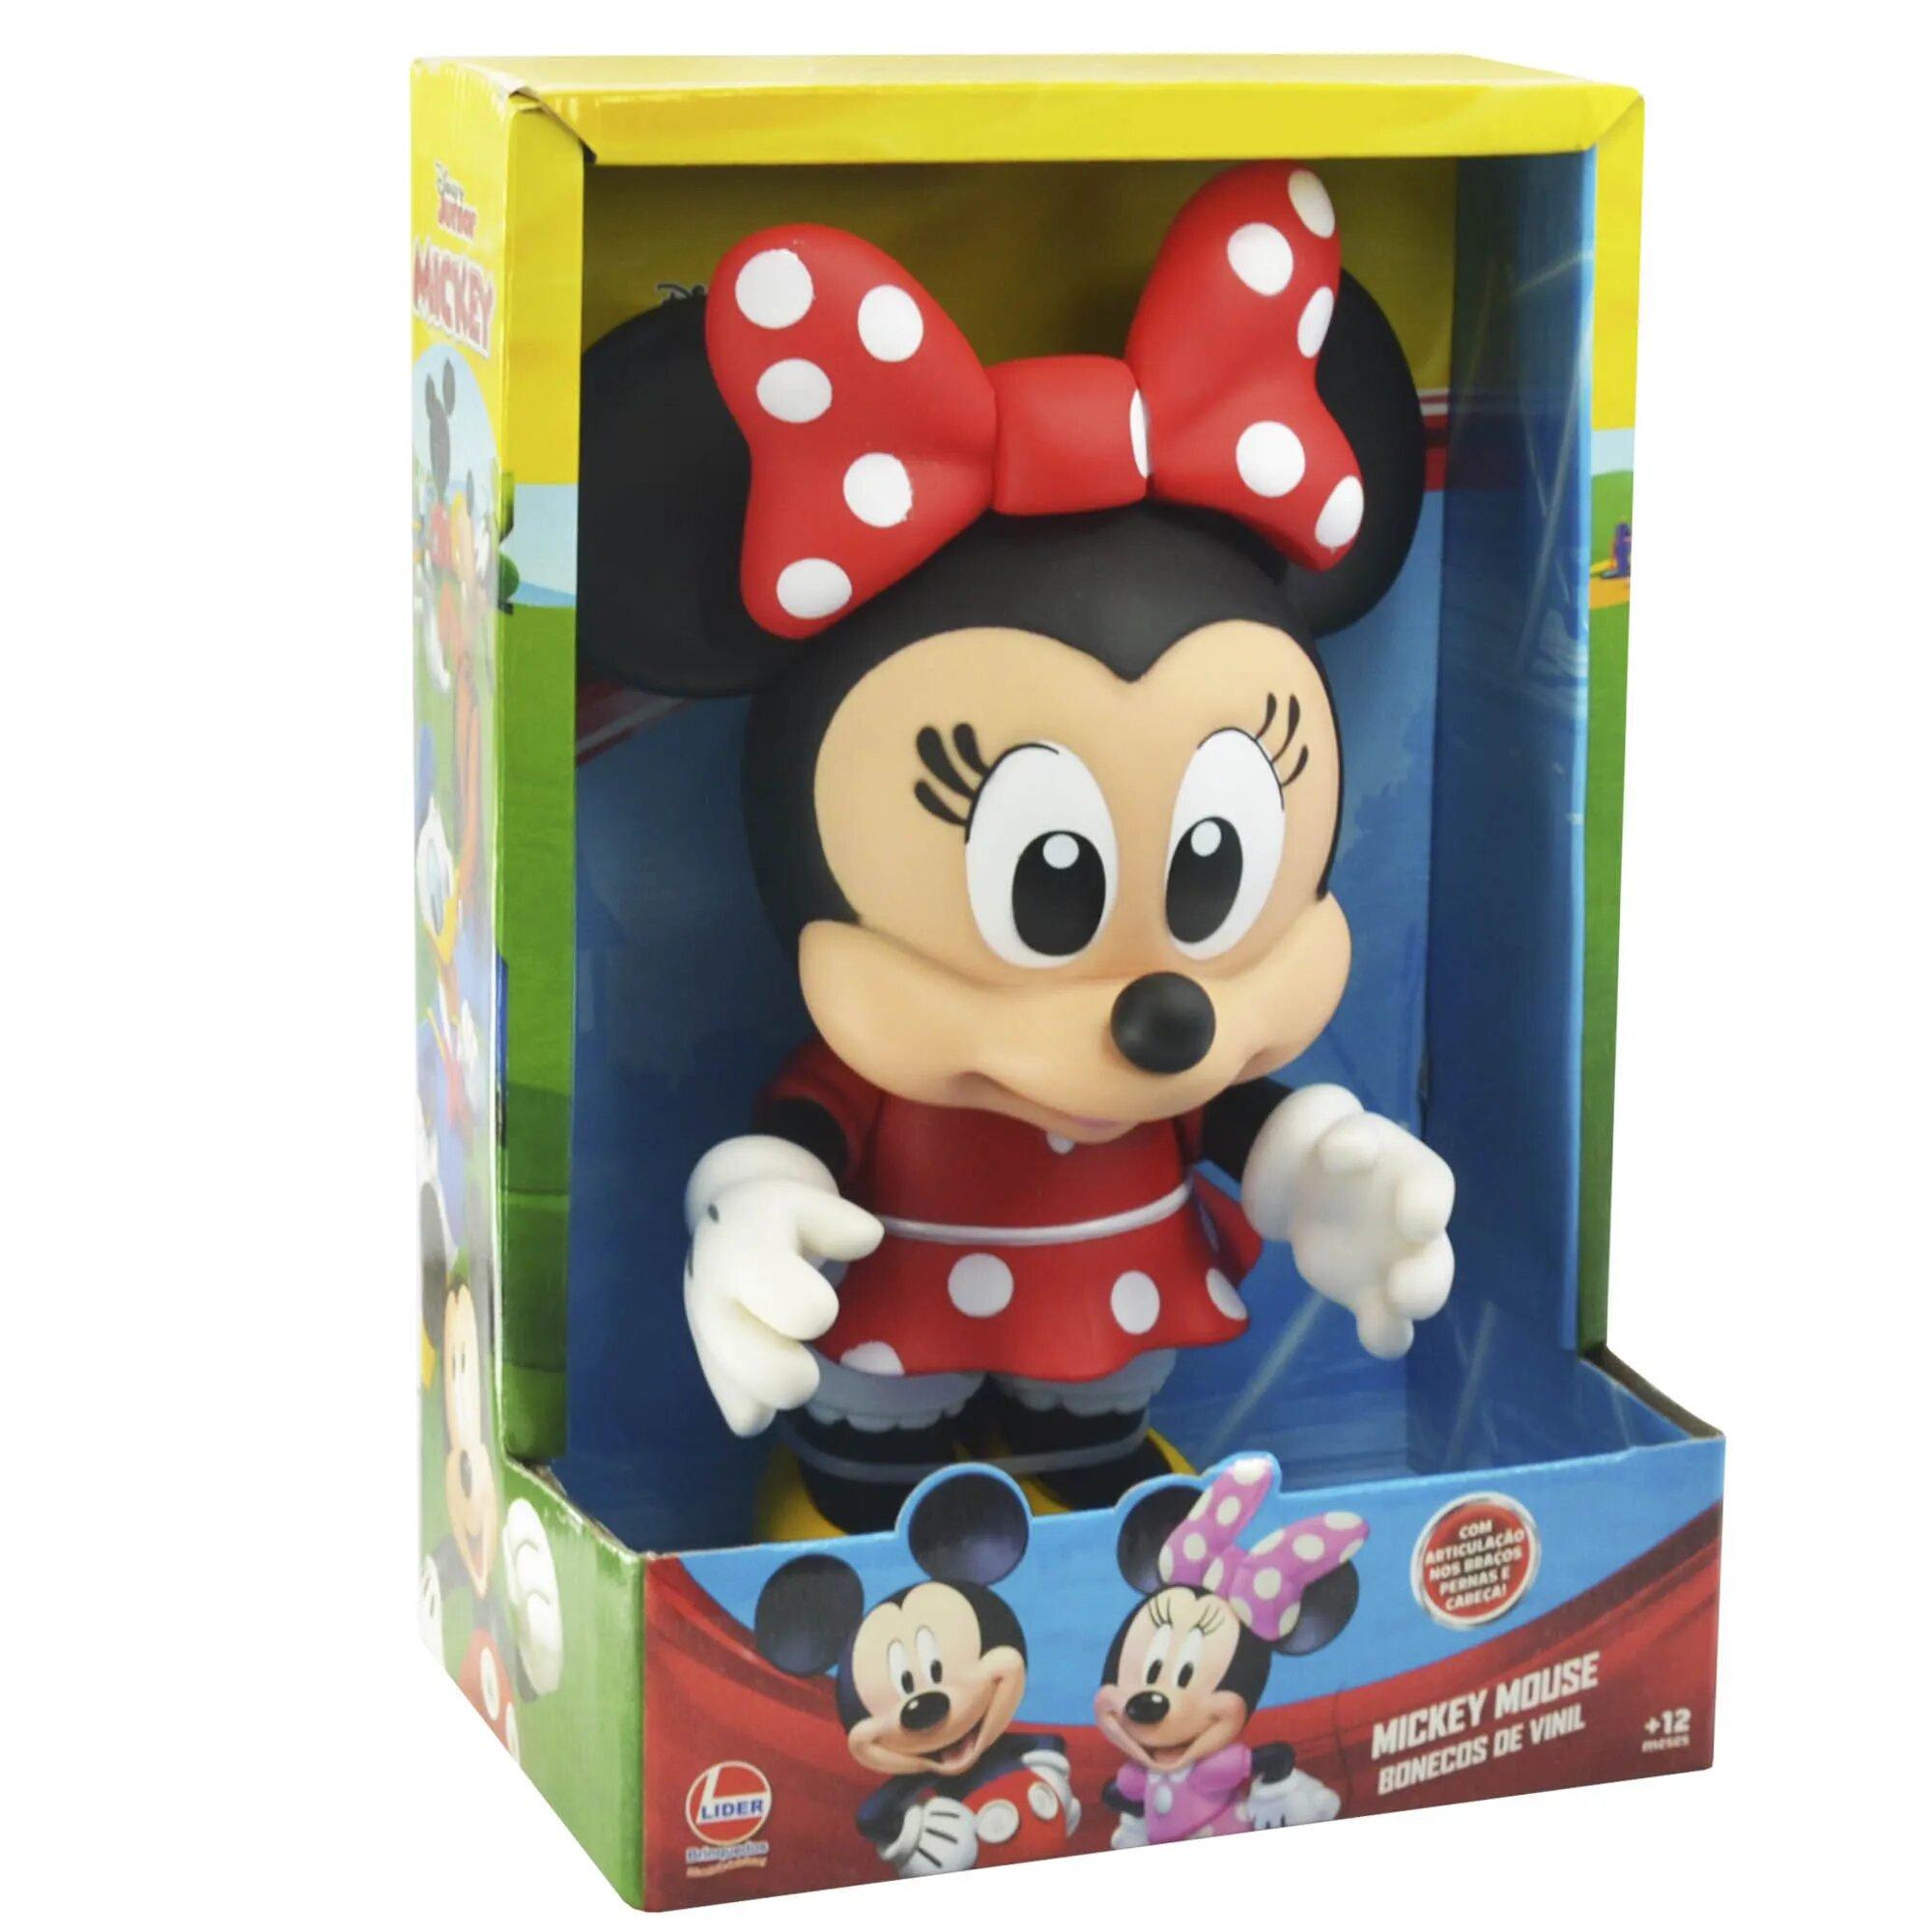 Boneco Vinil: Minnie Mouse Baby (Disney) - Lider